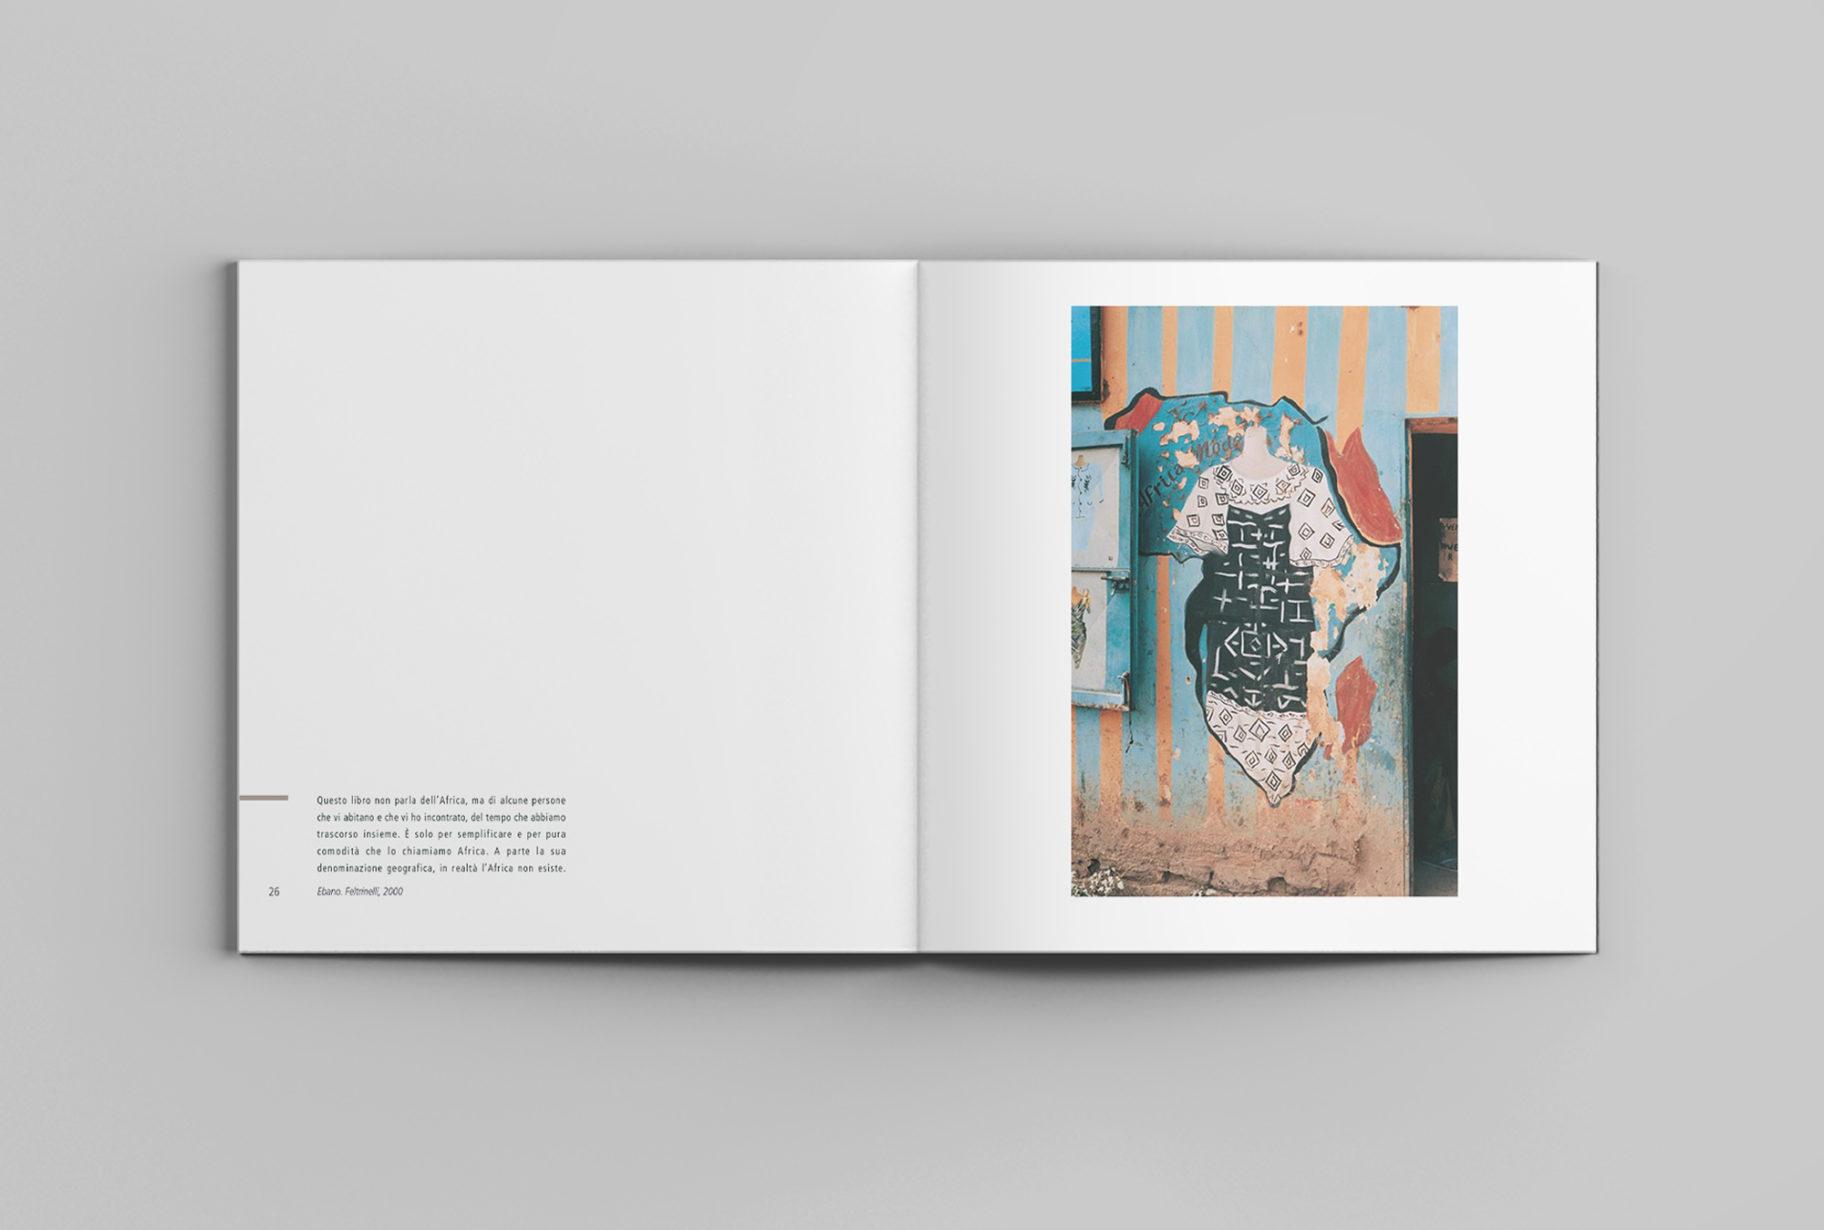 cenobio-kapuscinski-brochure-04